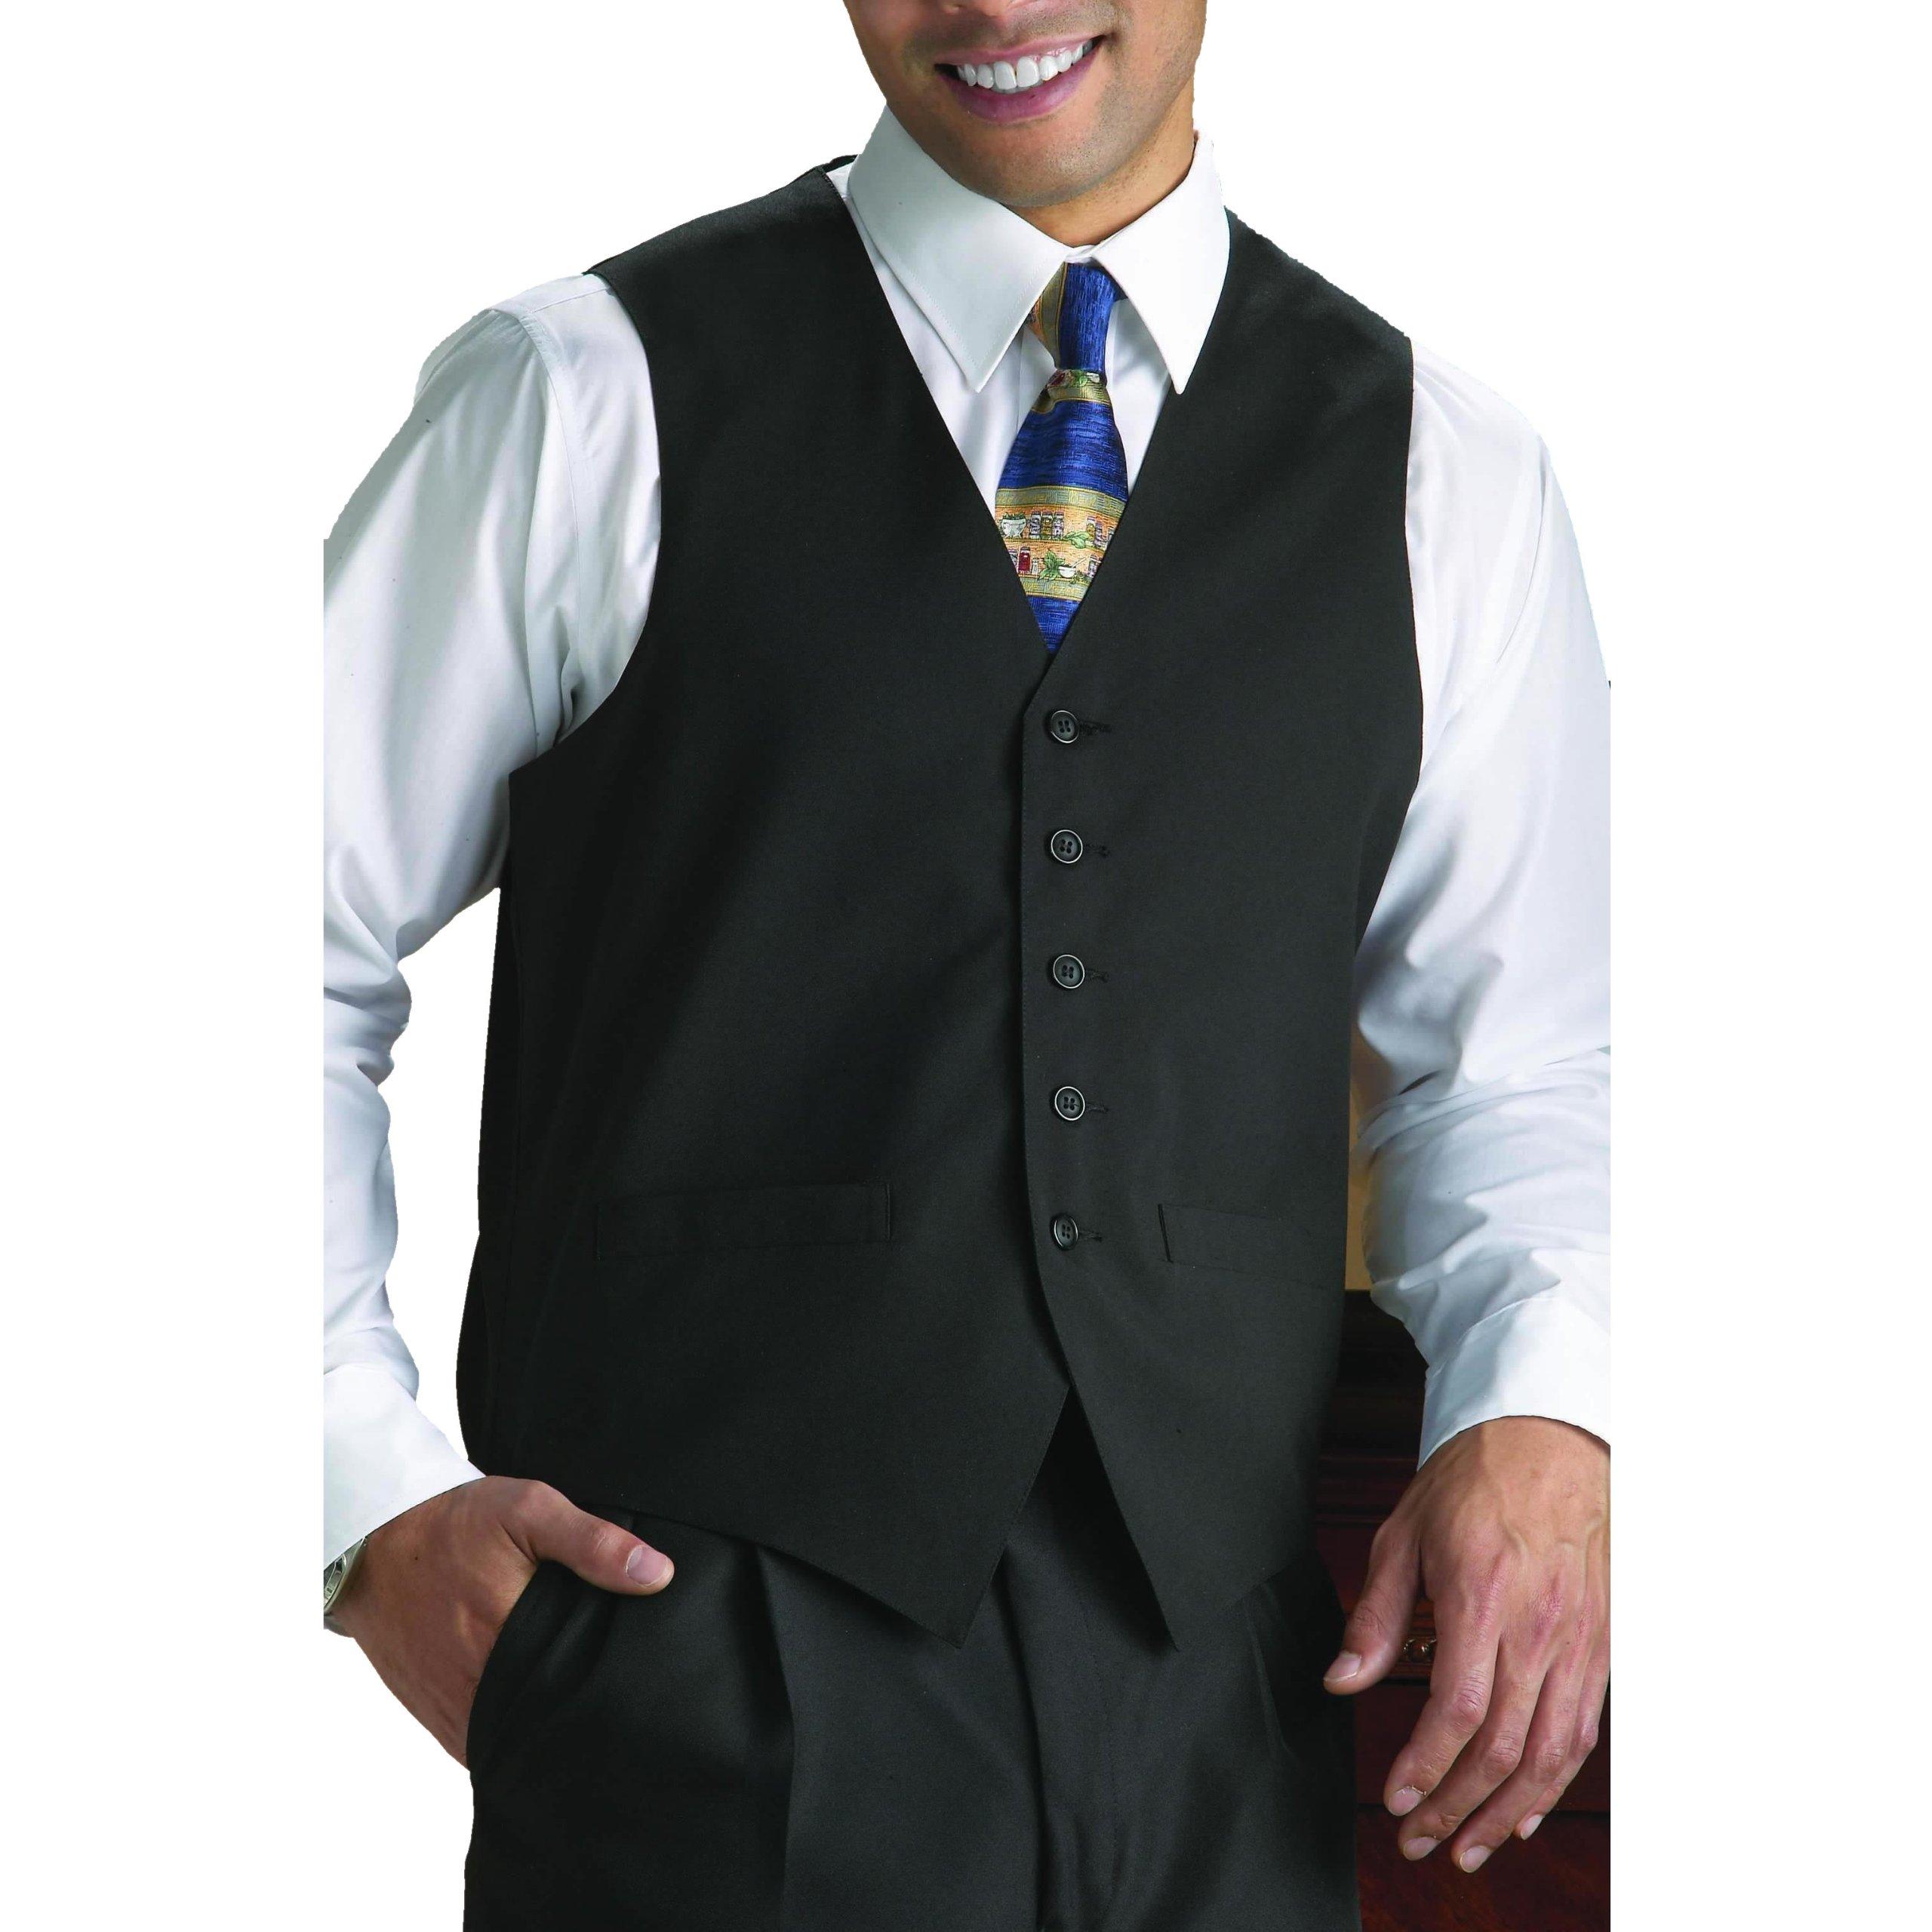 Neil Allyn 100% Polyester Solid Black Wait Staff Vest - X-Large